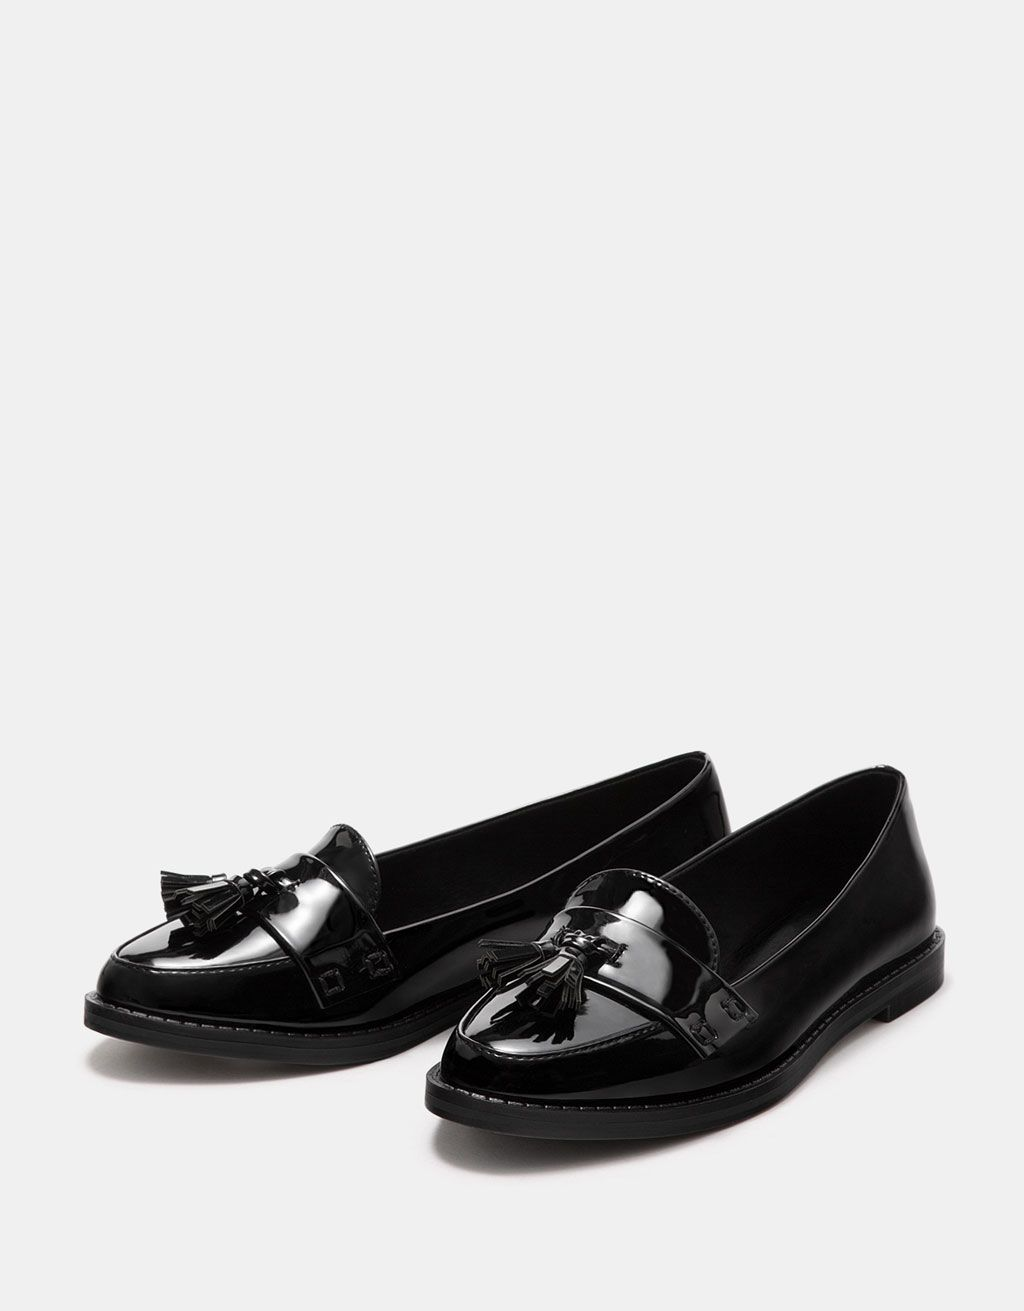 c732f542286 Tassel loafers - SHOES - Bershka United States